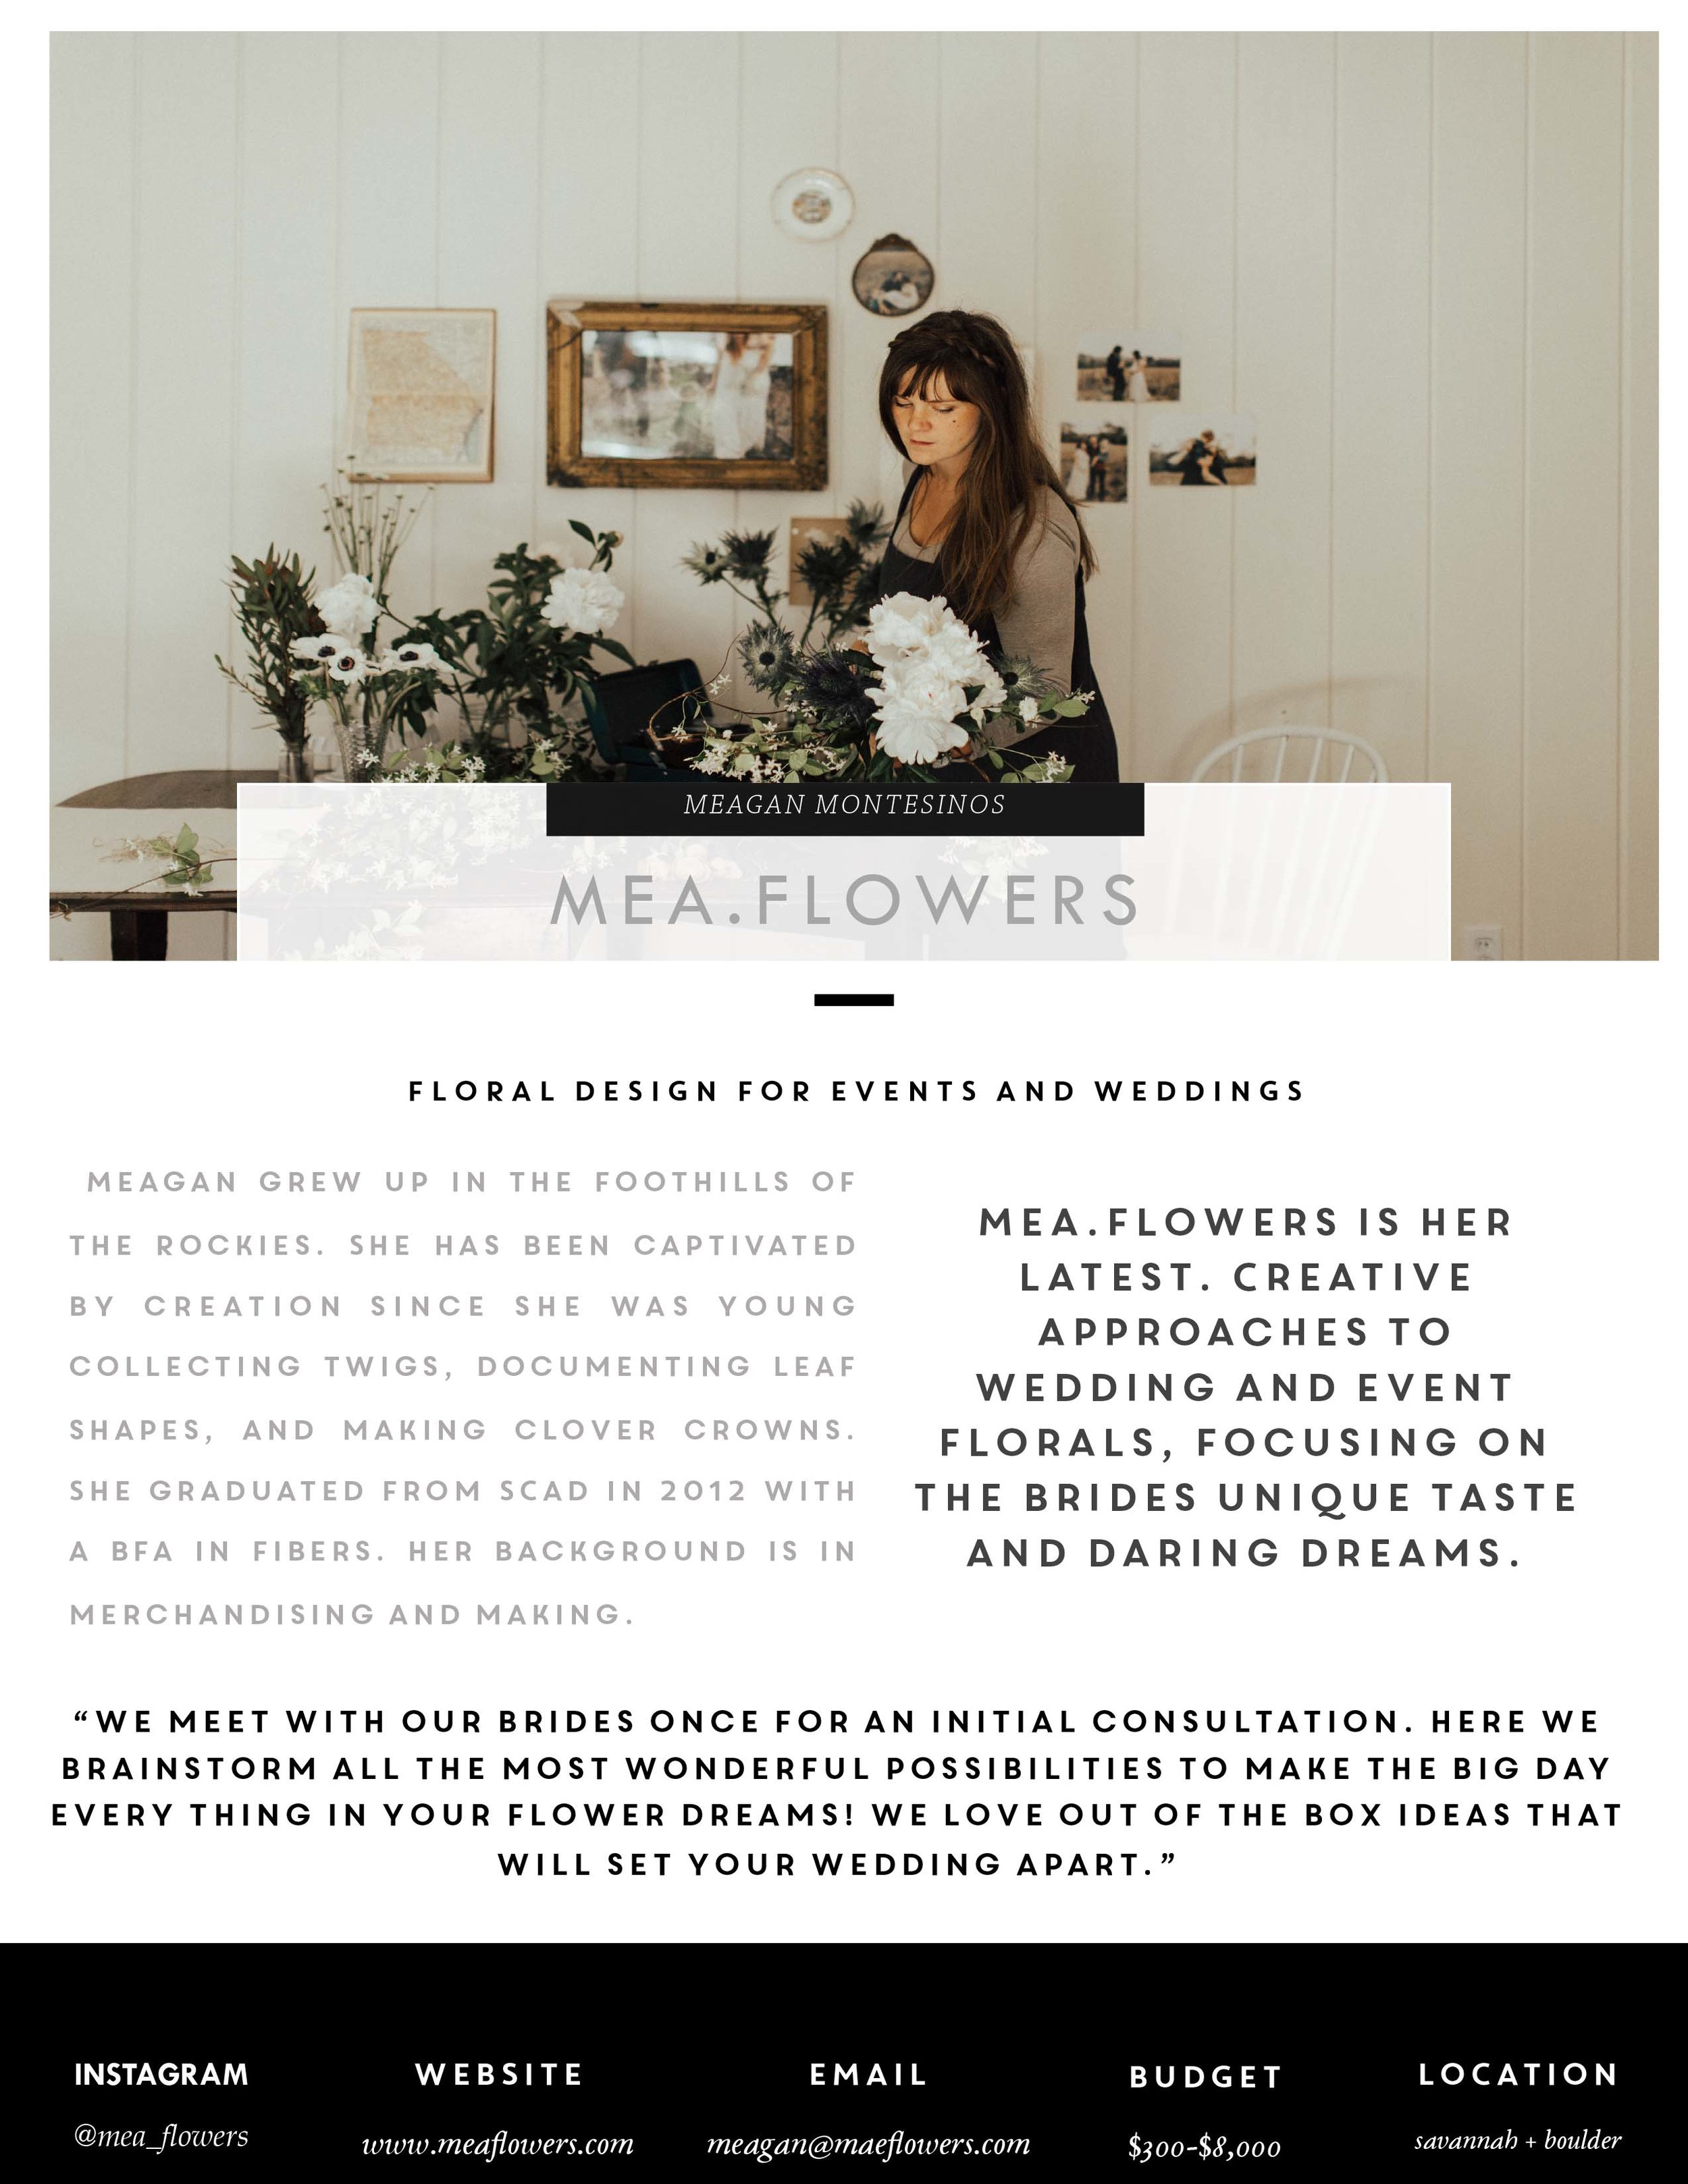 mea.flowers-savannah-wedding-vendor-blog-post-1 copy.jpg